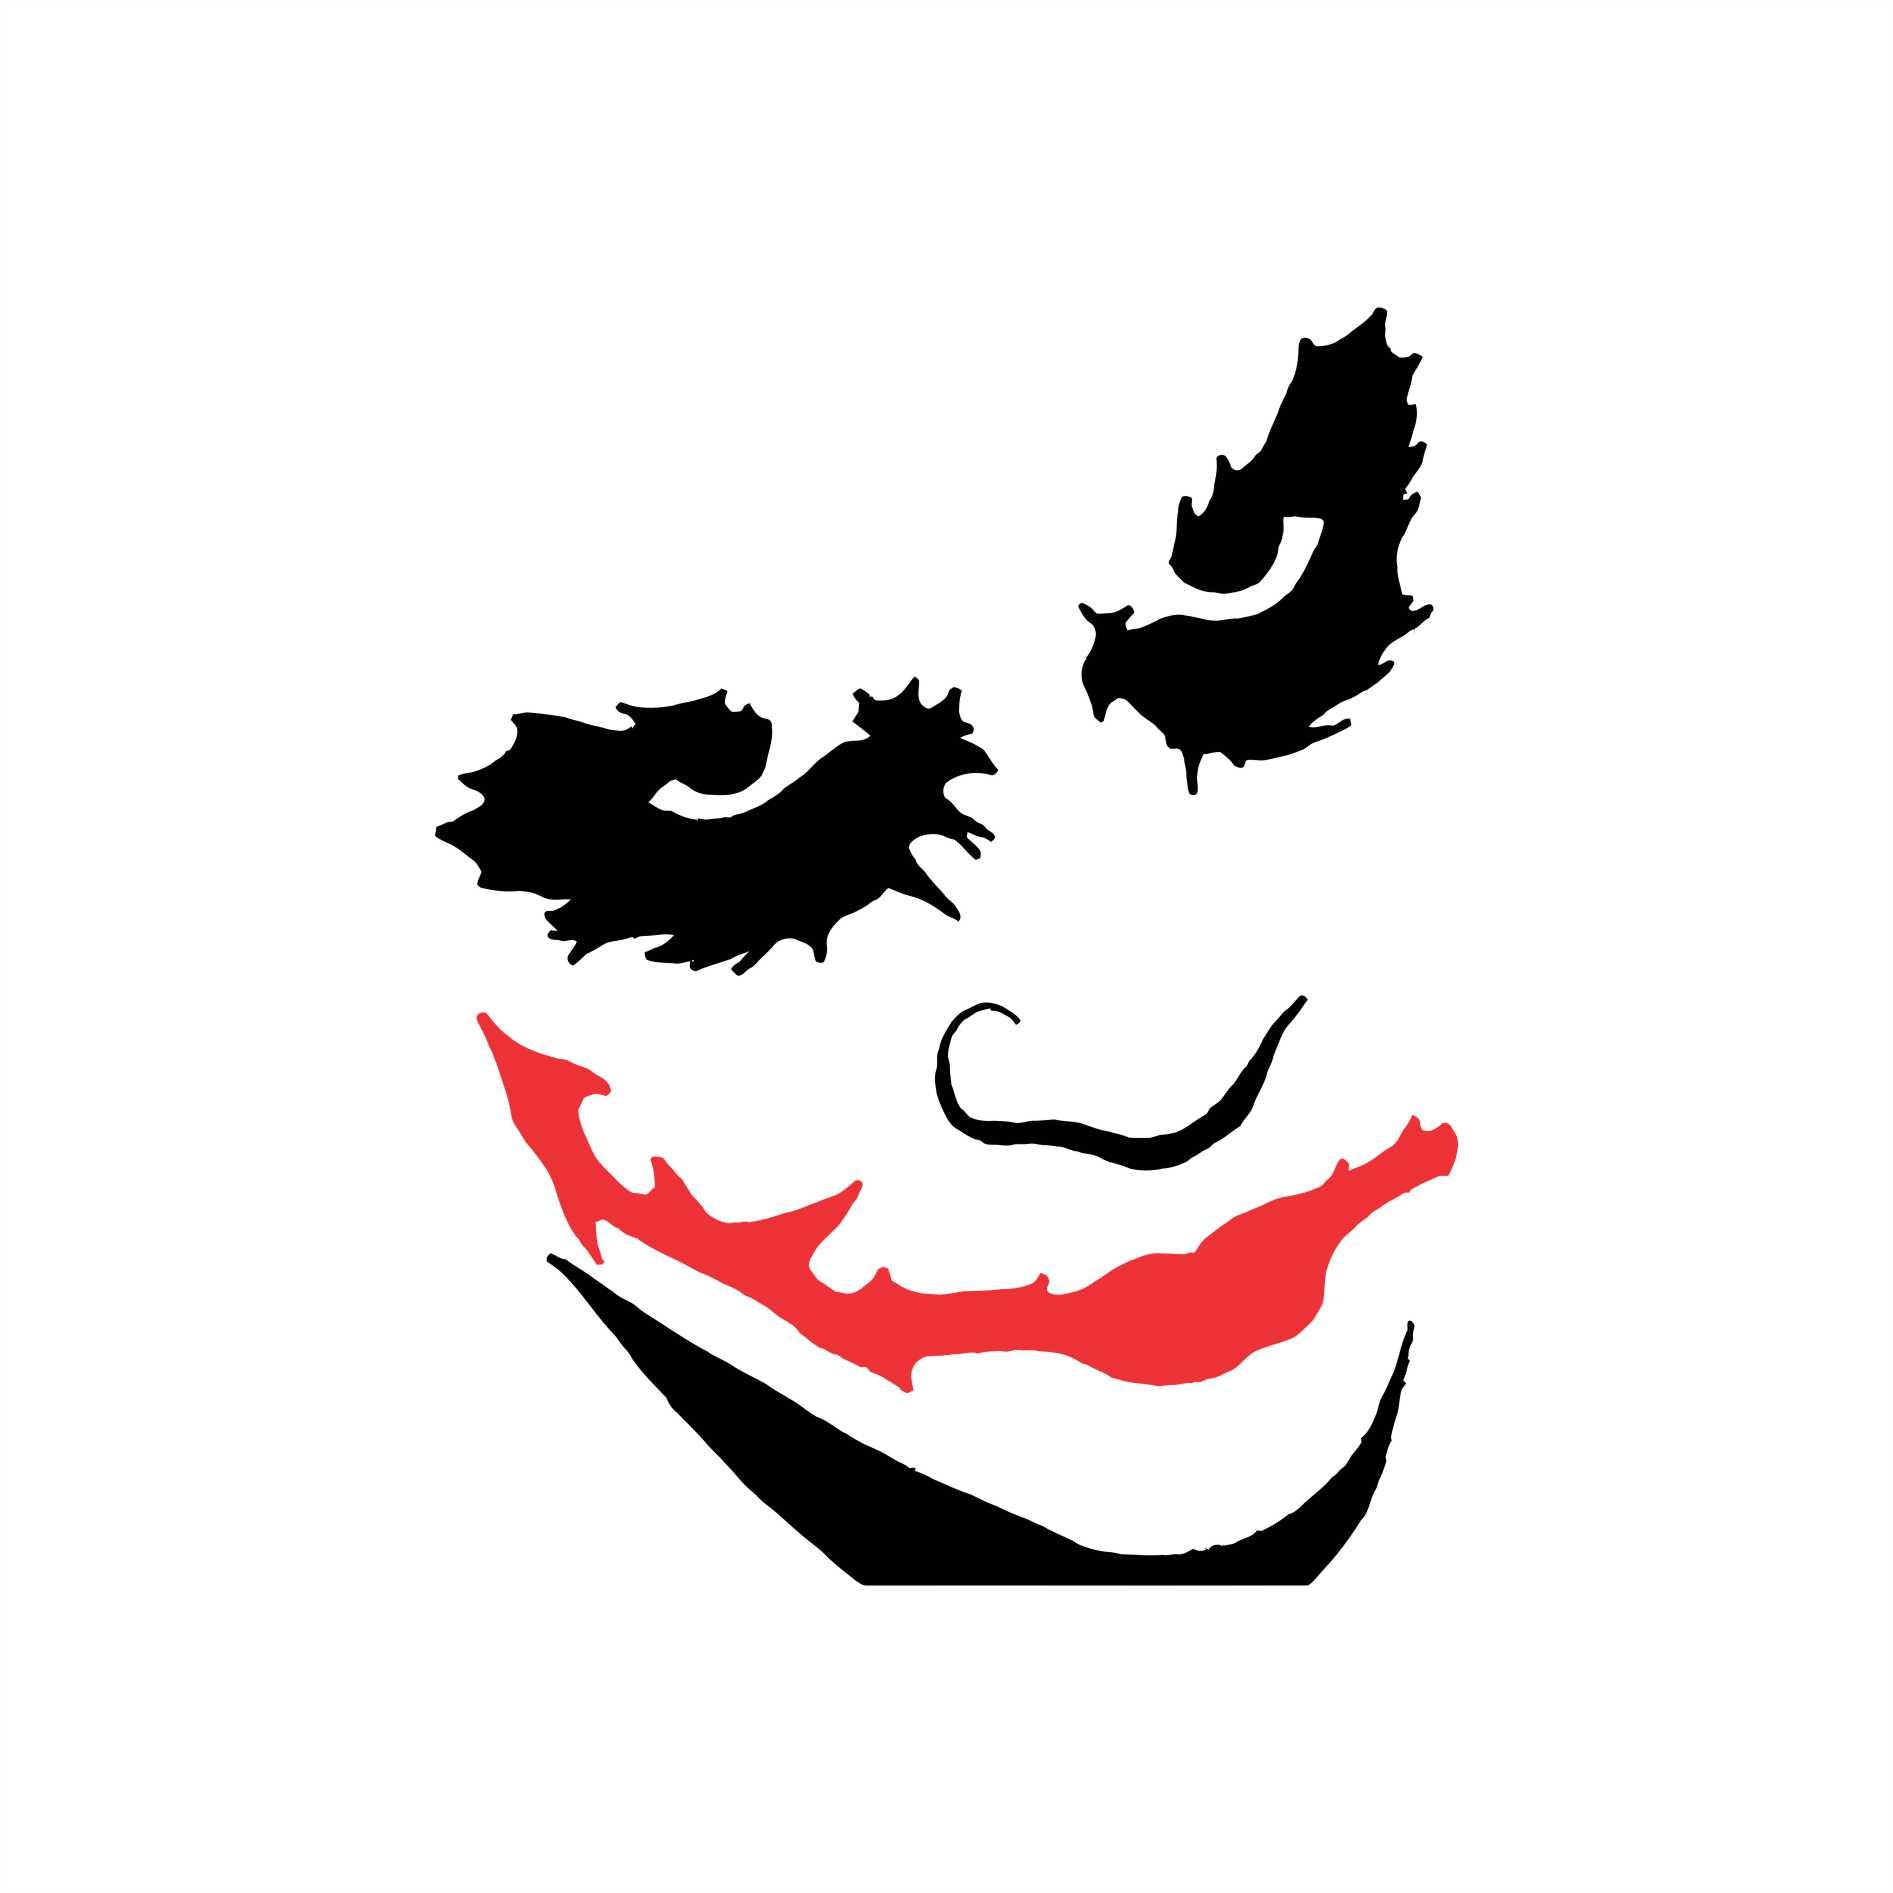 Adesivo Batman Coringa Joker 02 10x8cm